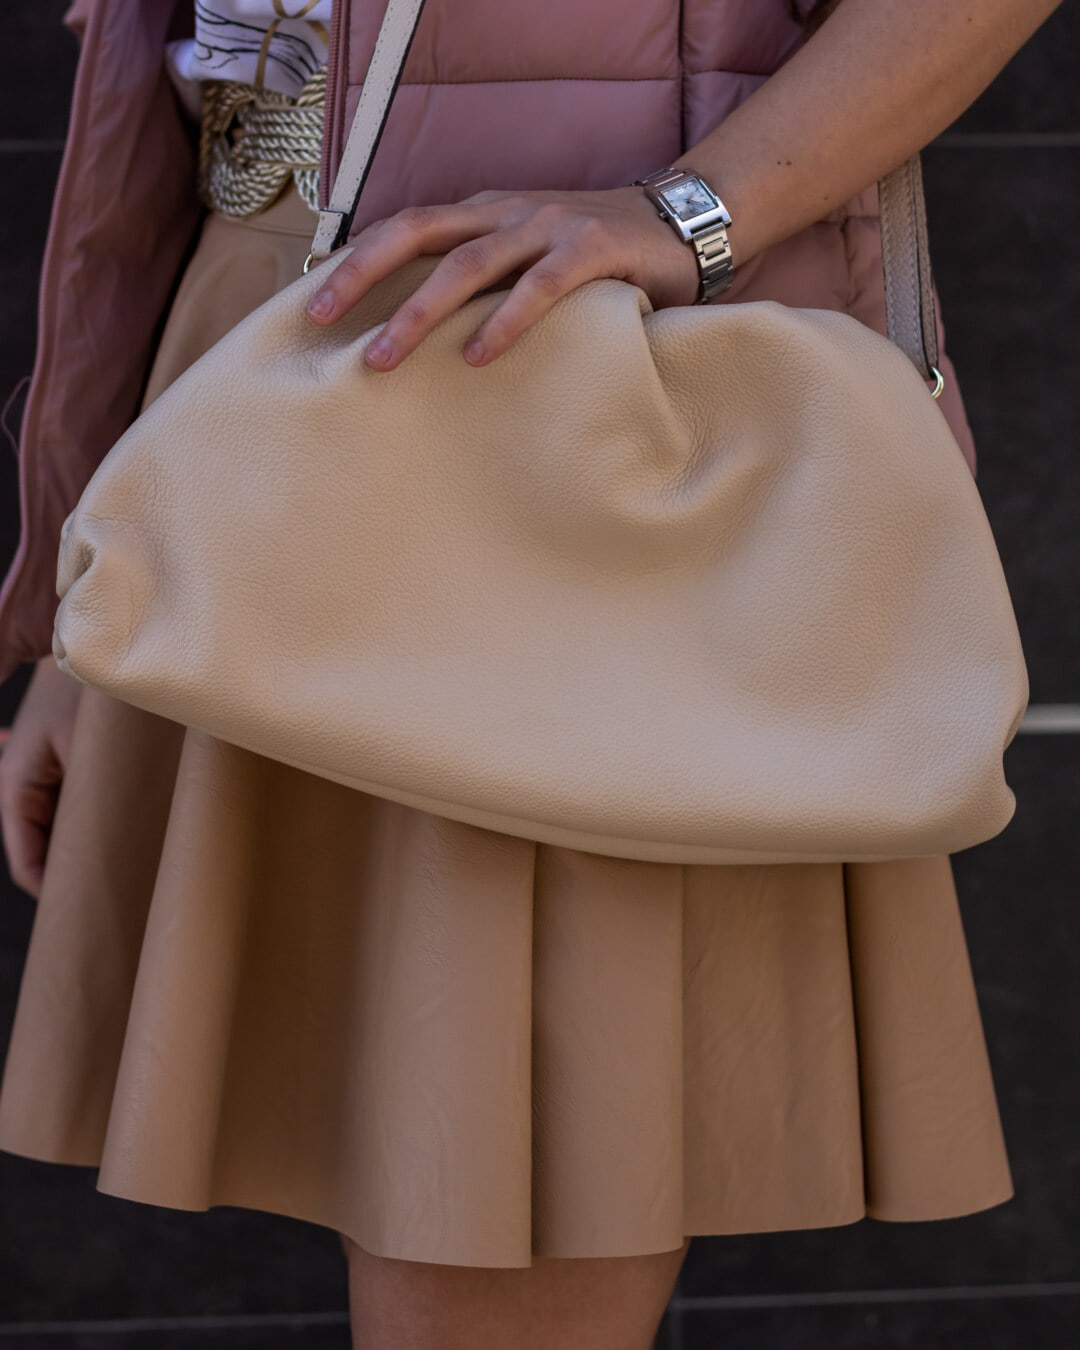 Handtasche, hellbraun, Pastell, Frau, Mädchen, Mode, Modell, Porträt, Glanz, Luxus